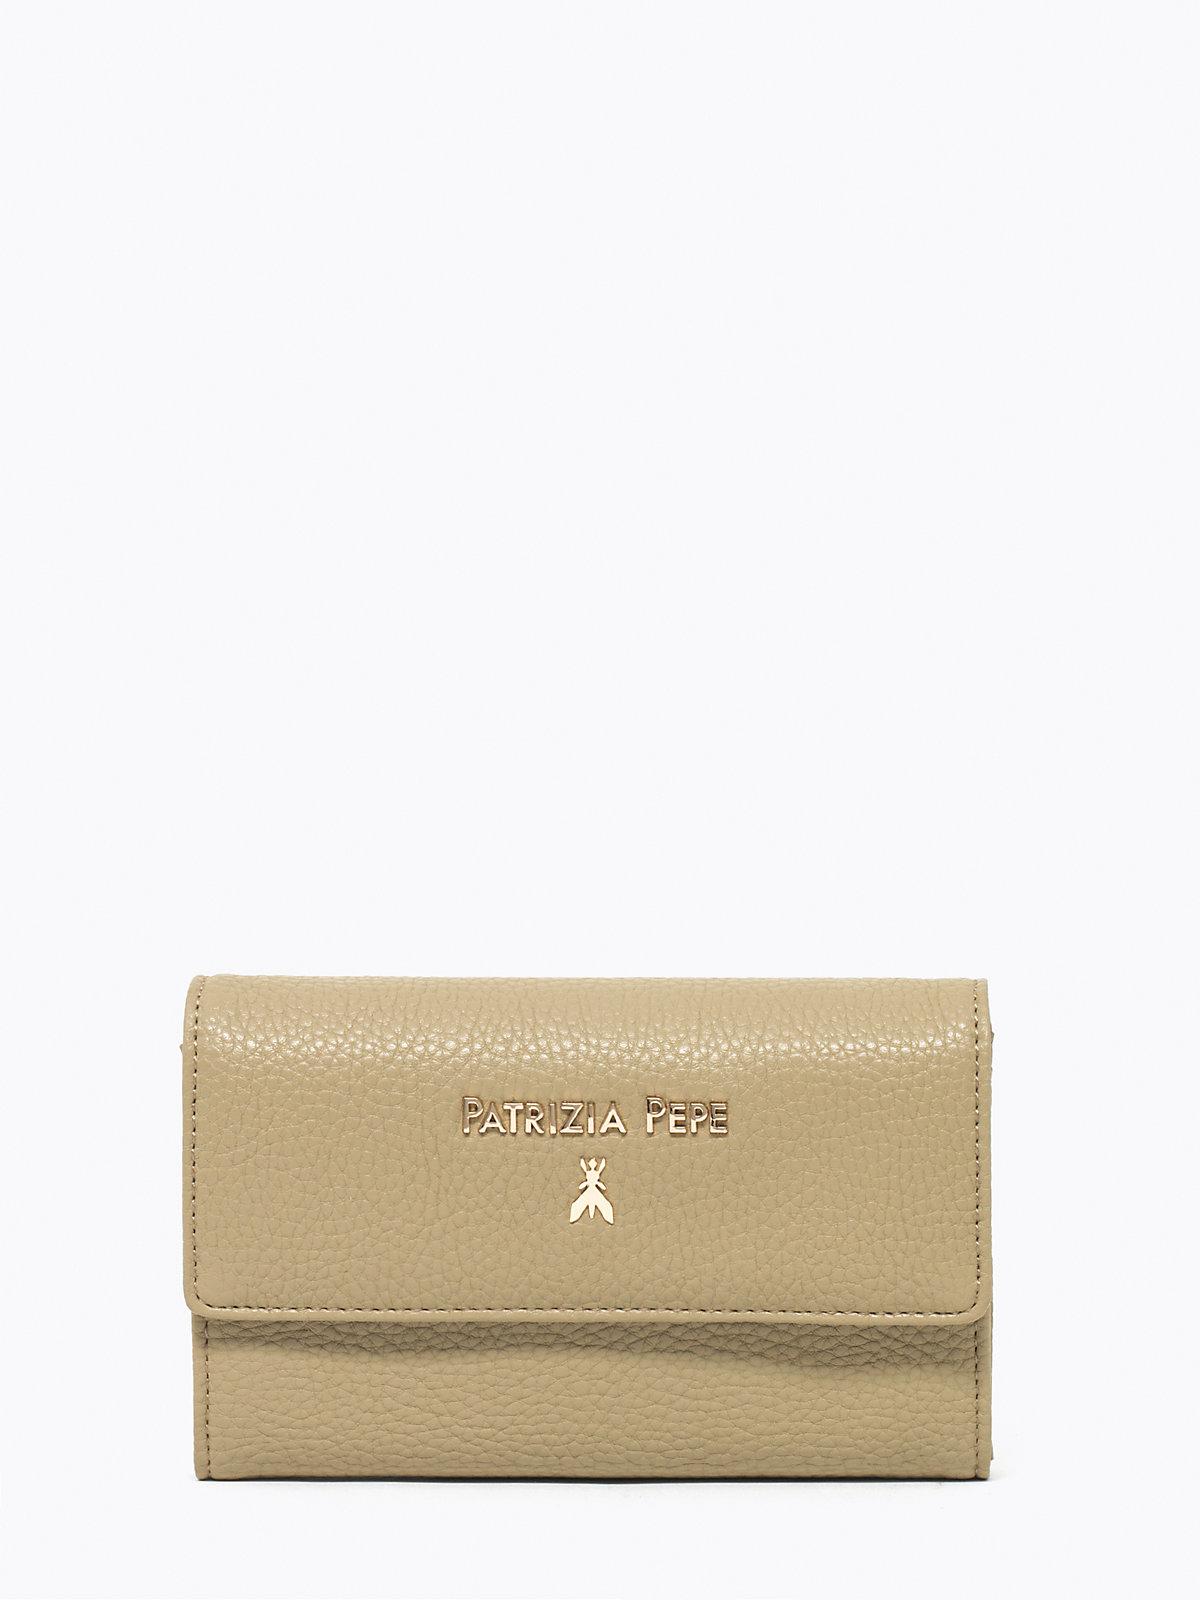 patrizia pepe mini clutch bag with shoulder strap in. Black Bedroom Furniture Sets. Home Design Ideas